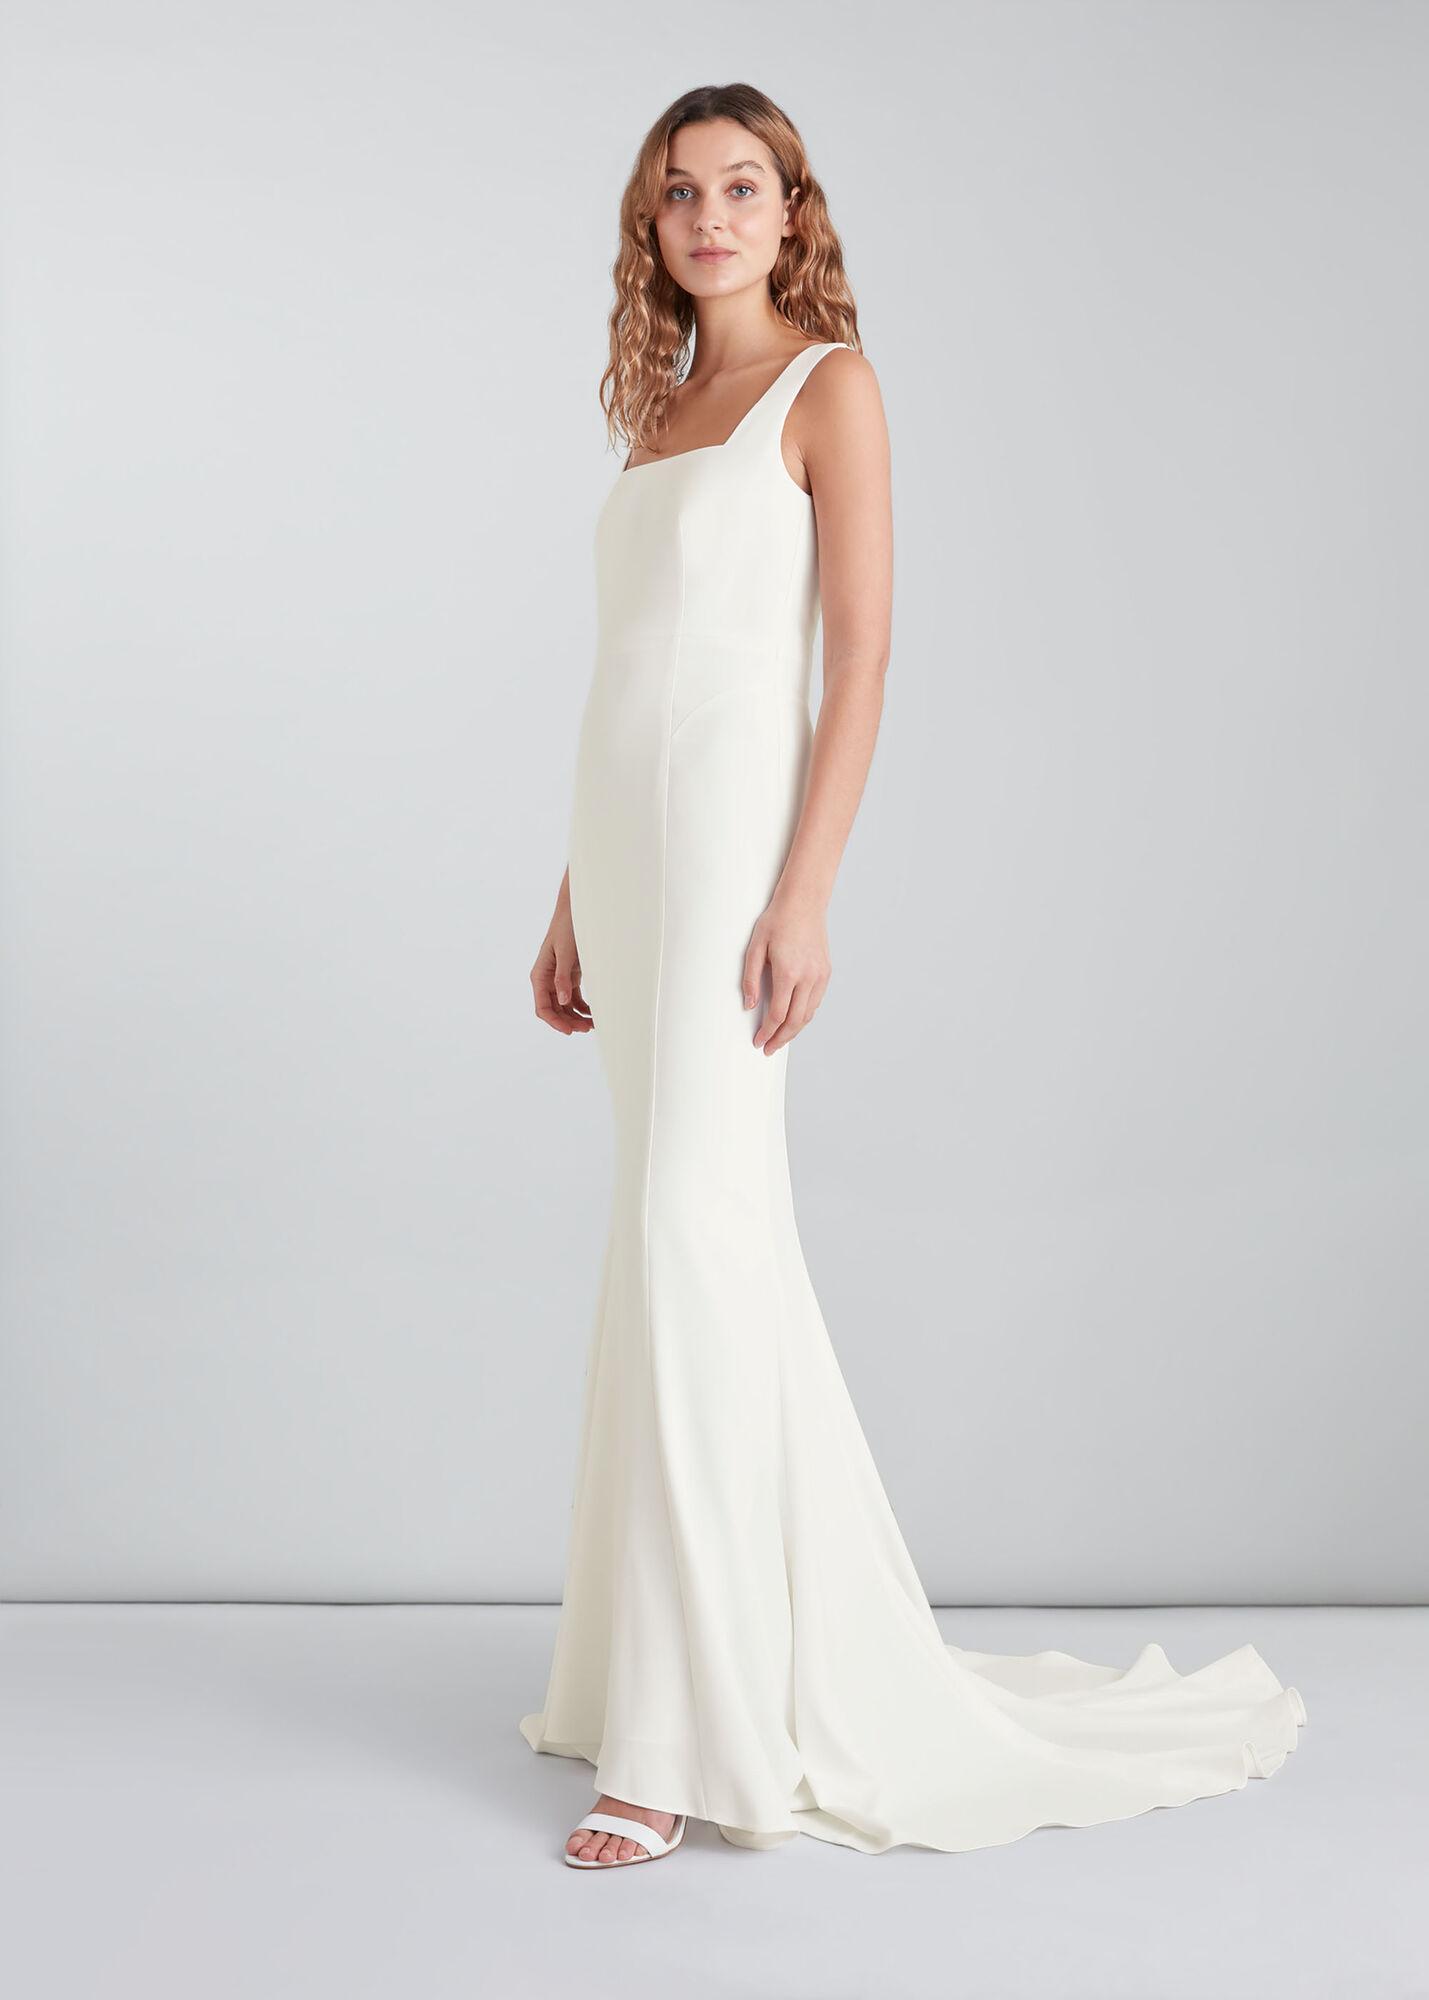 Mia Square Neck Wedding Dress